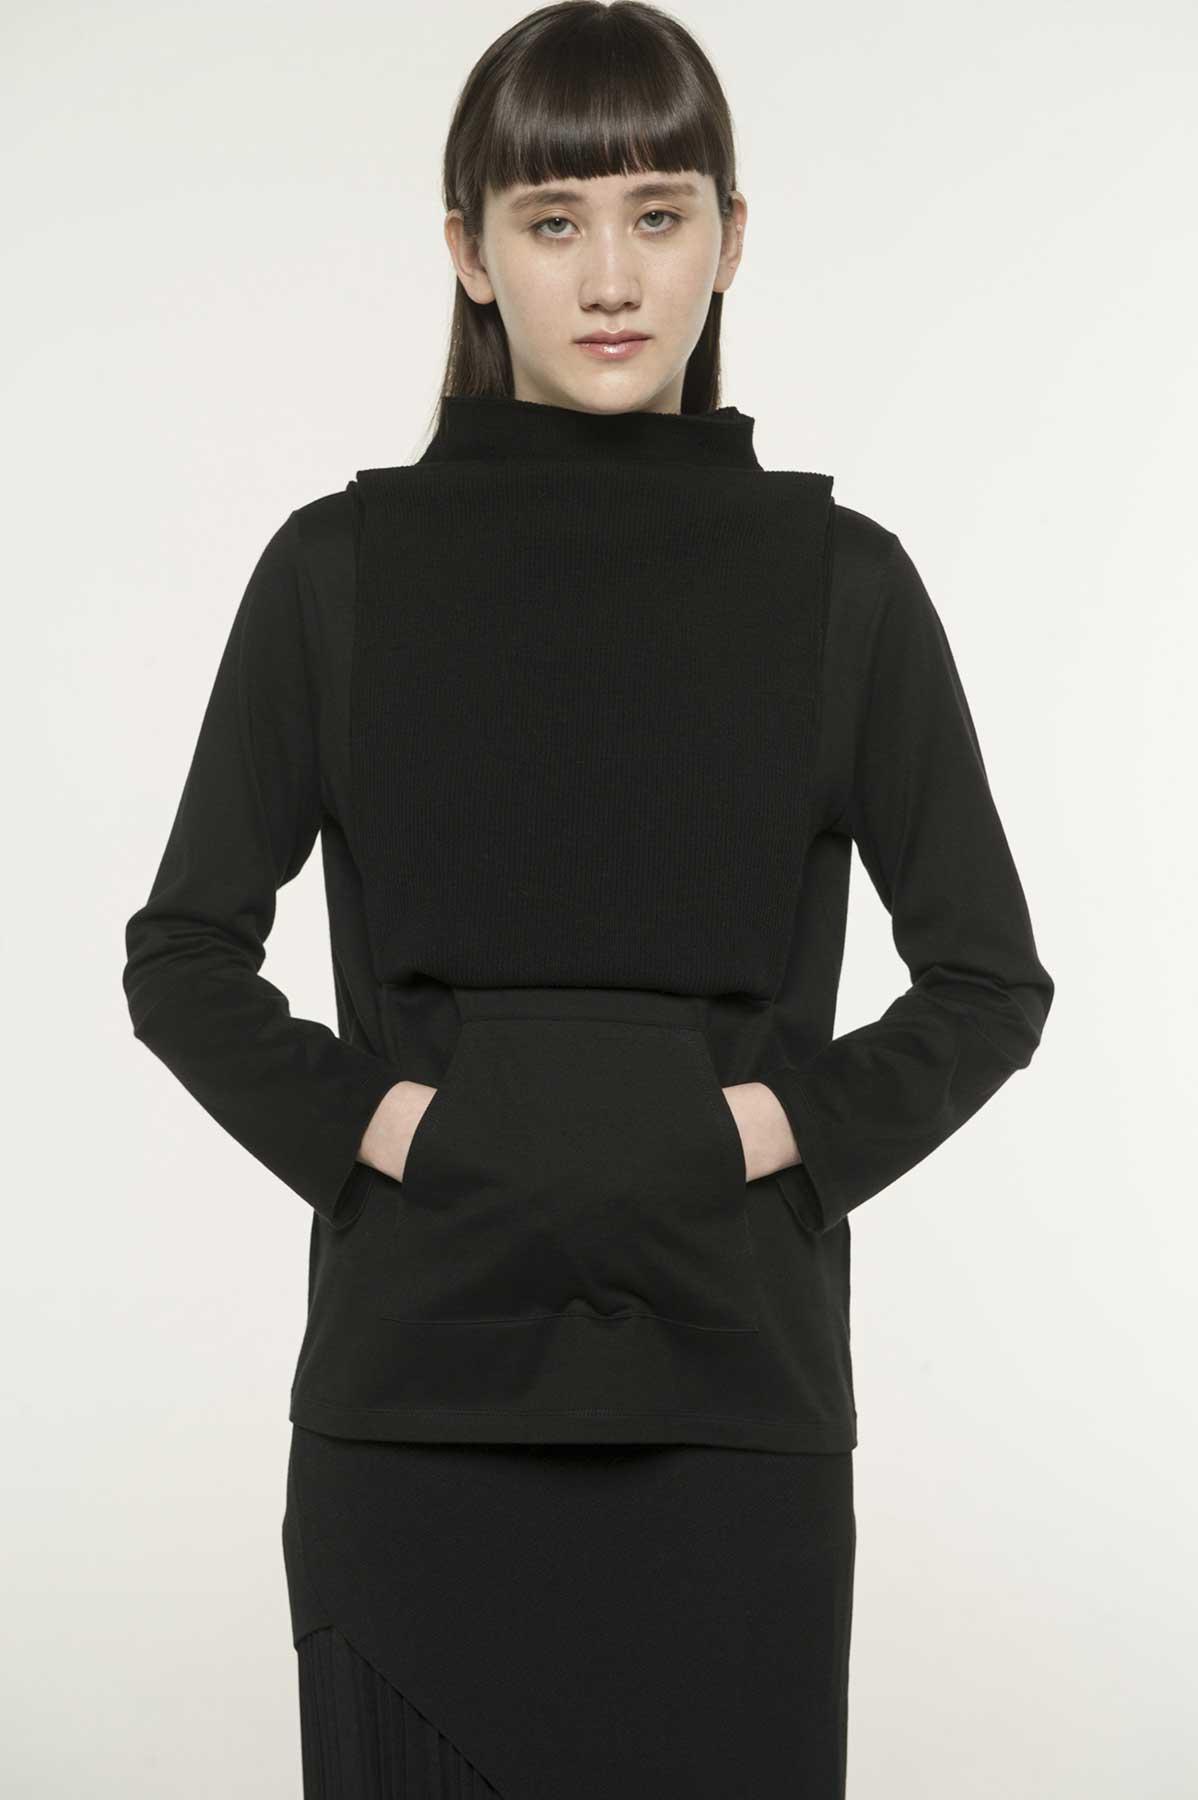 RISMATbyY这款Cotton Tengu长袖T恤采用围裙针织